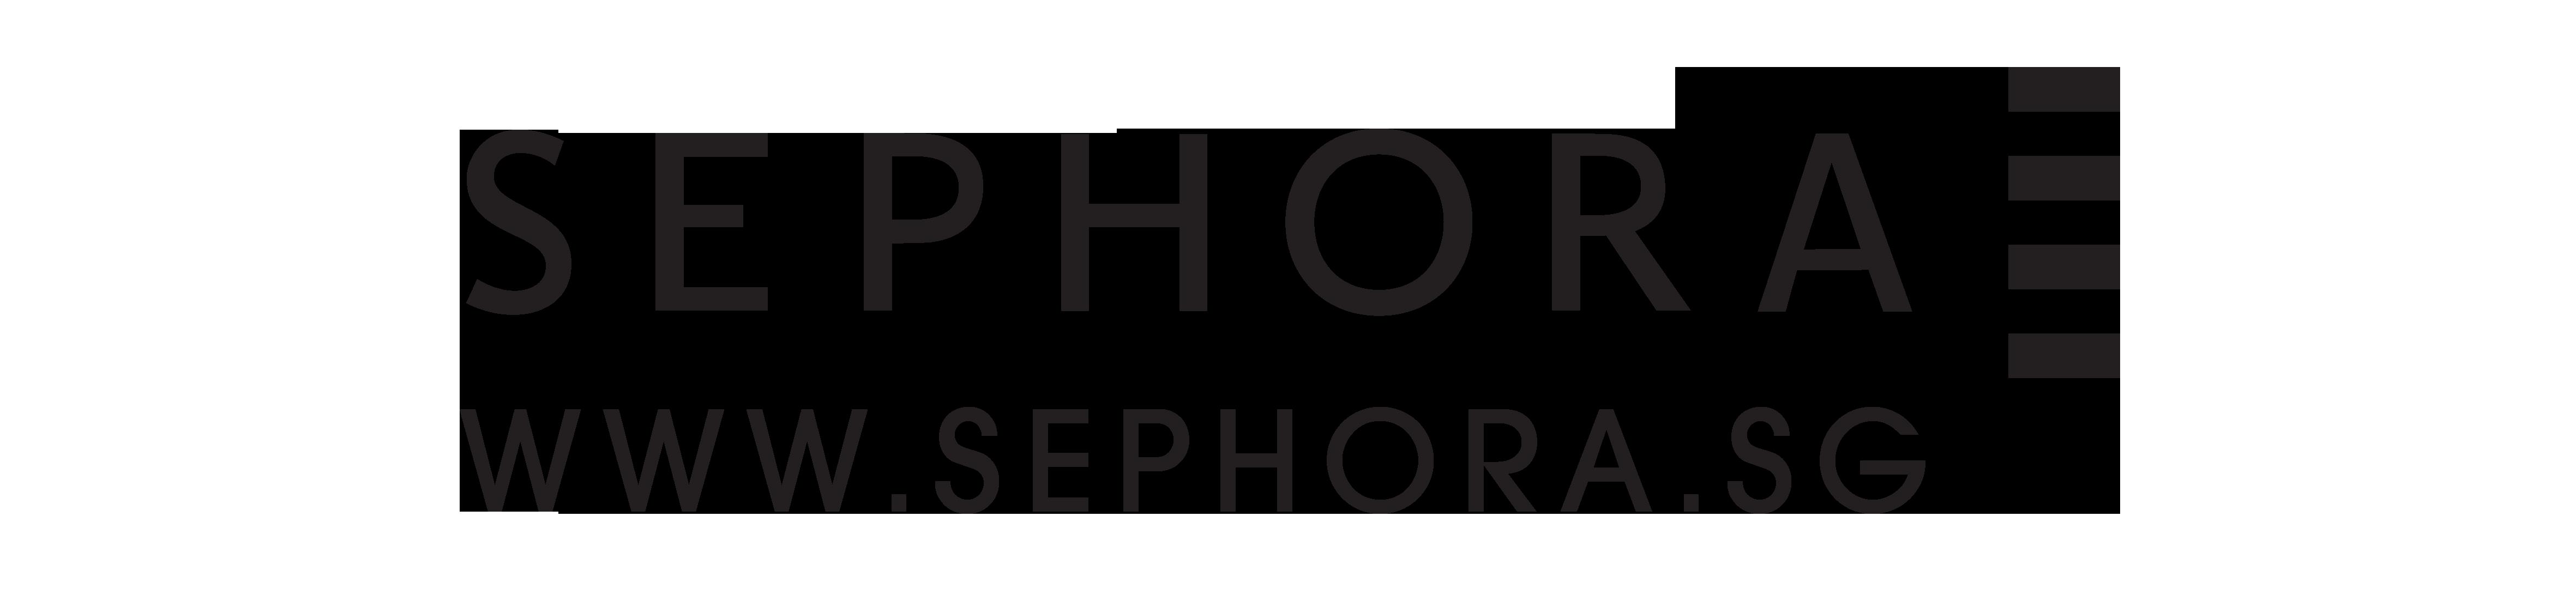 Sephora Coupon